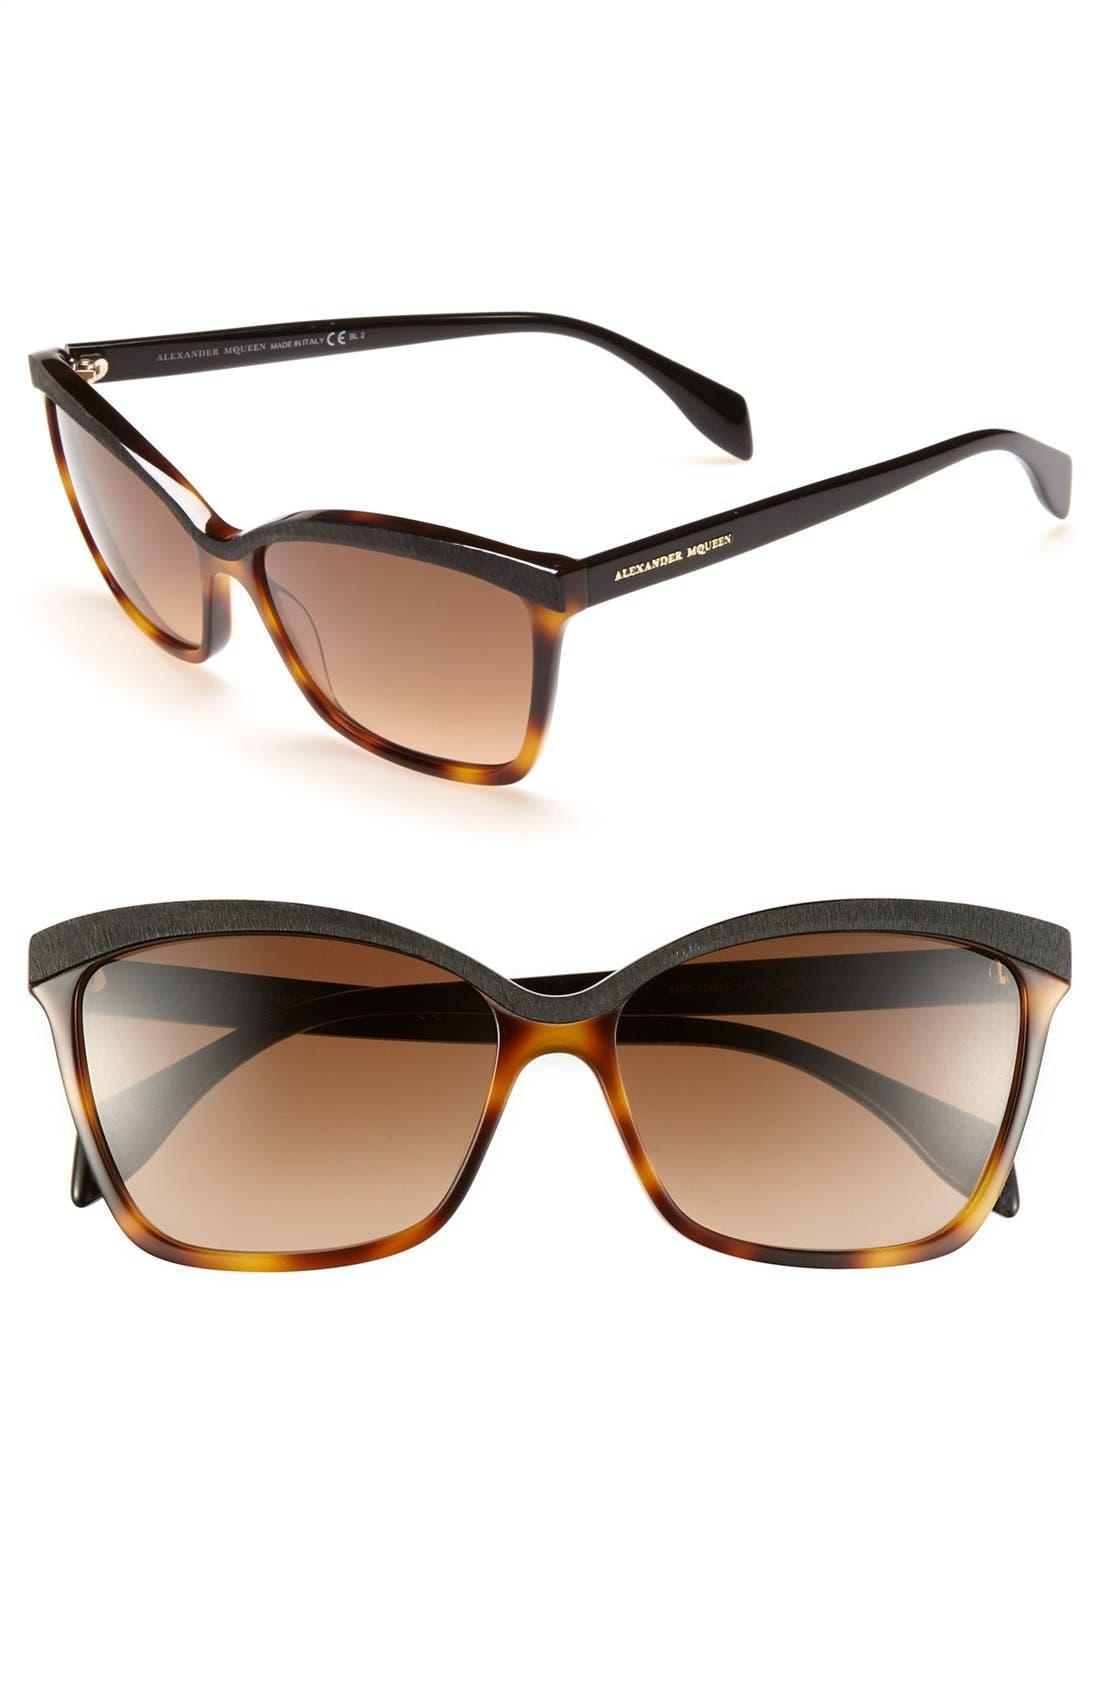 Alternate Image 1 Selected - Alexander McQueen 58mm 'Retro' Sunglasses